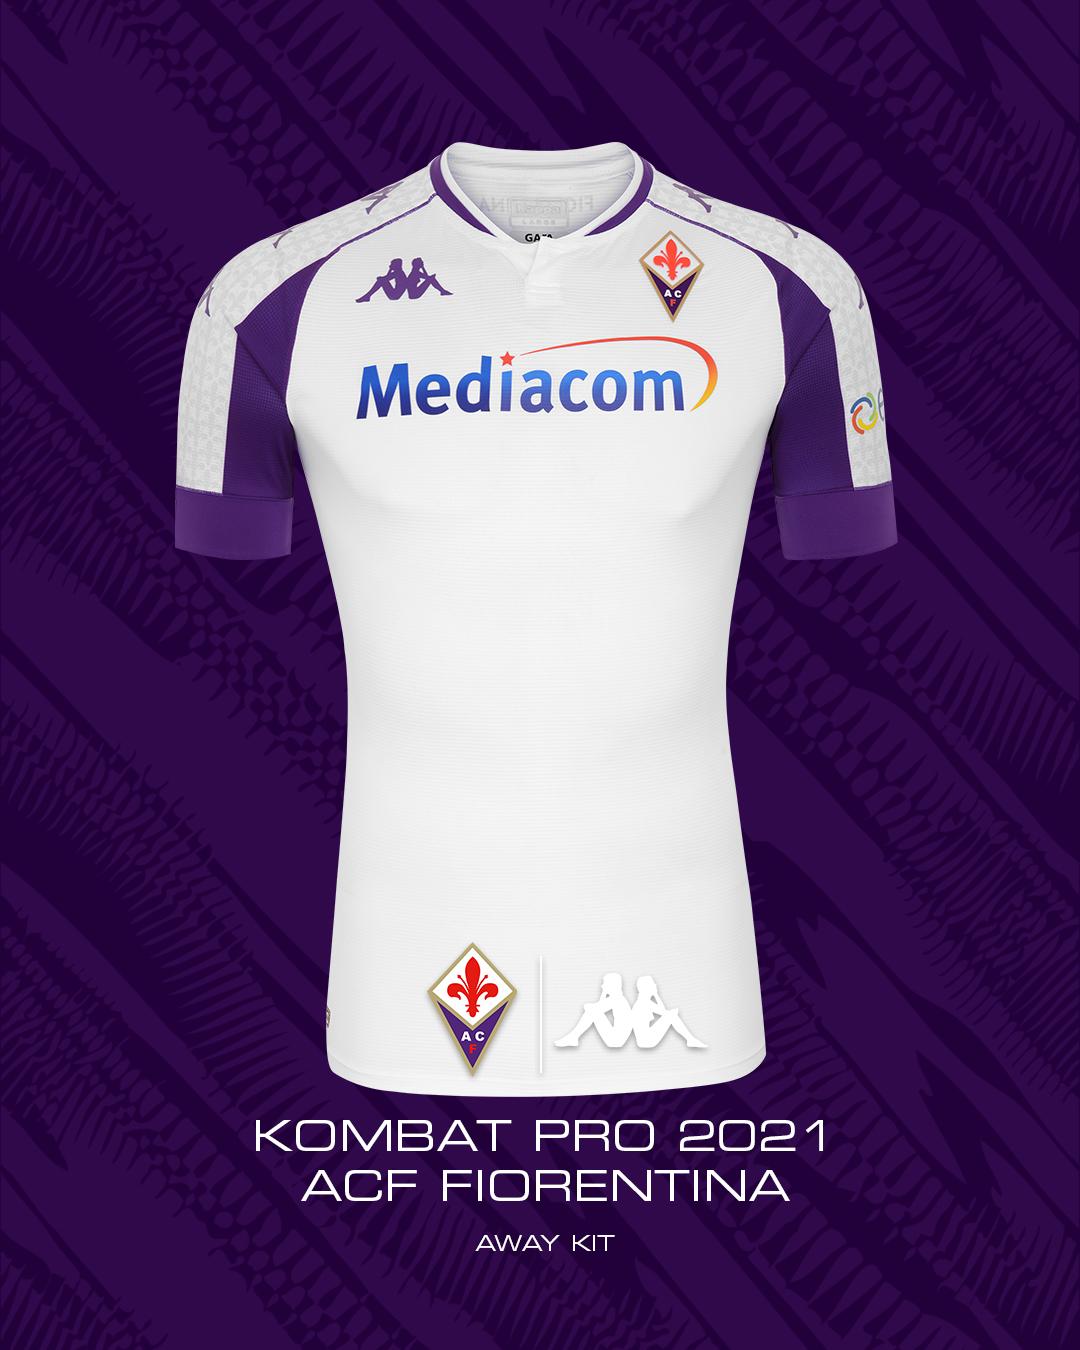 Fiorentina 2020-21 Kappa Away Kit | 20/21 Kits | Football shirt blog